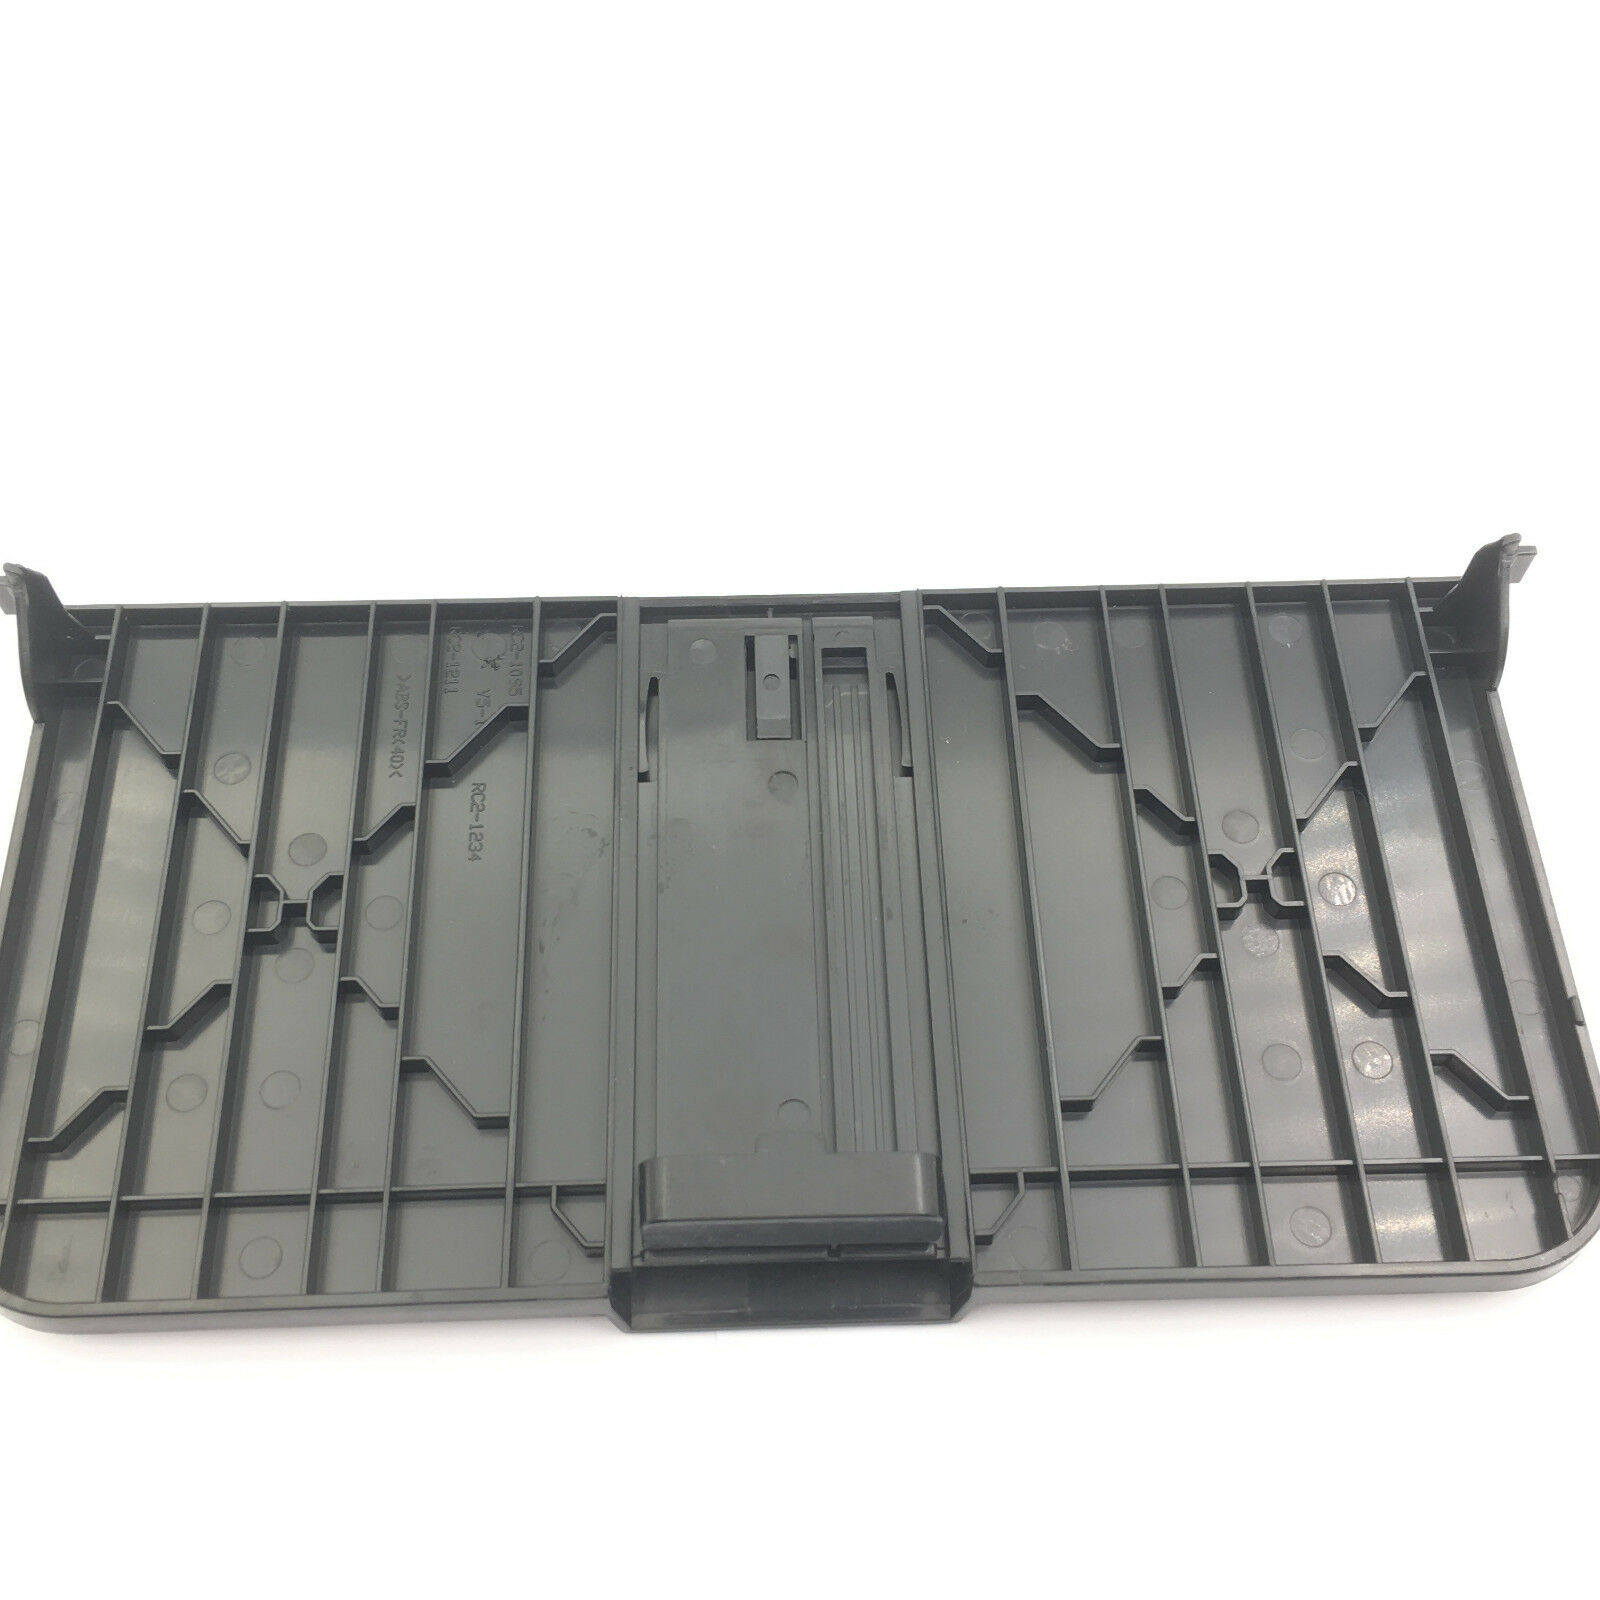 Genuine HP LaserJet P2015 Left Cover W// Removable Door RC2-0328 RC2-0331